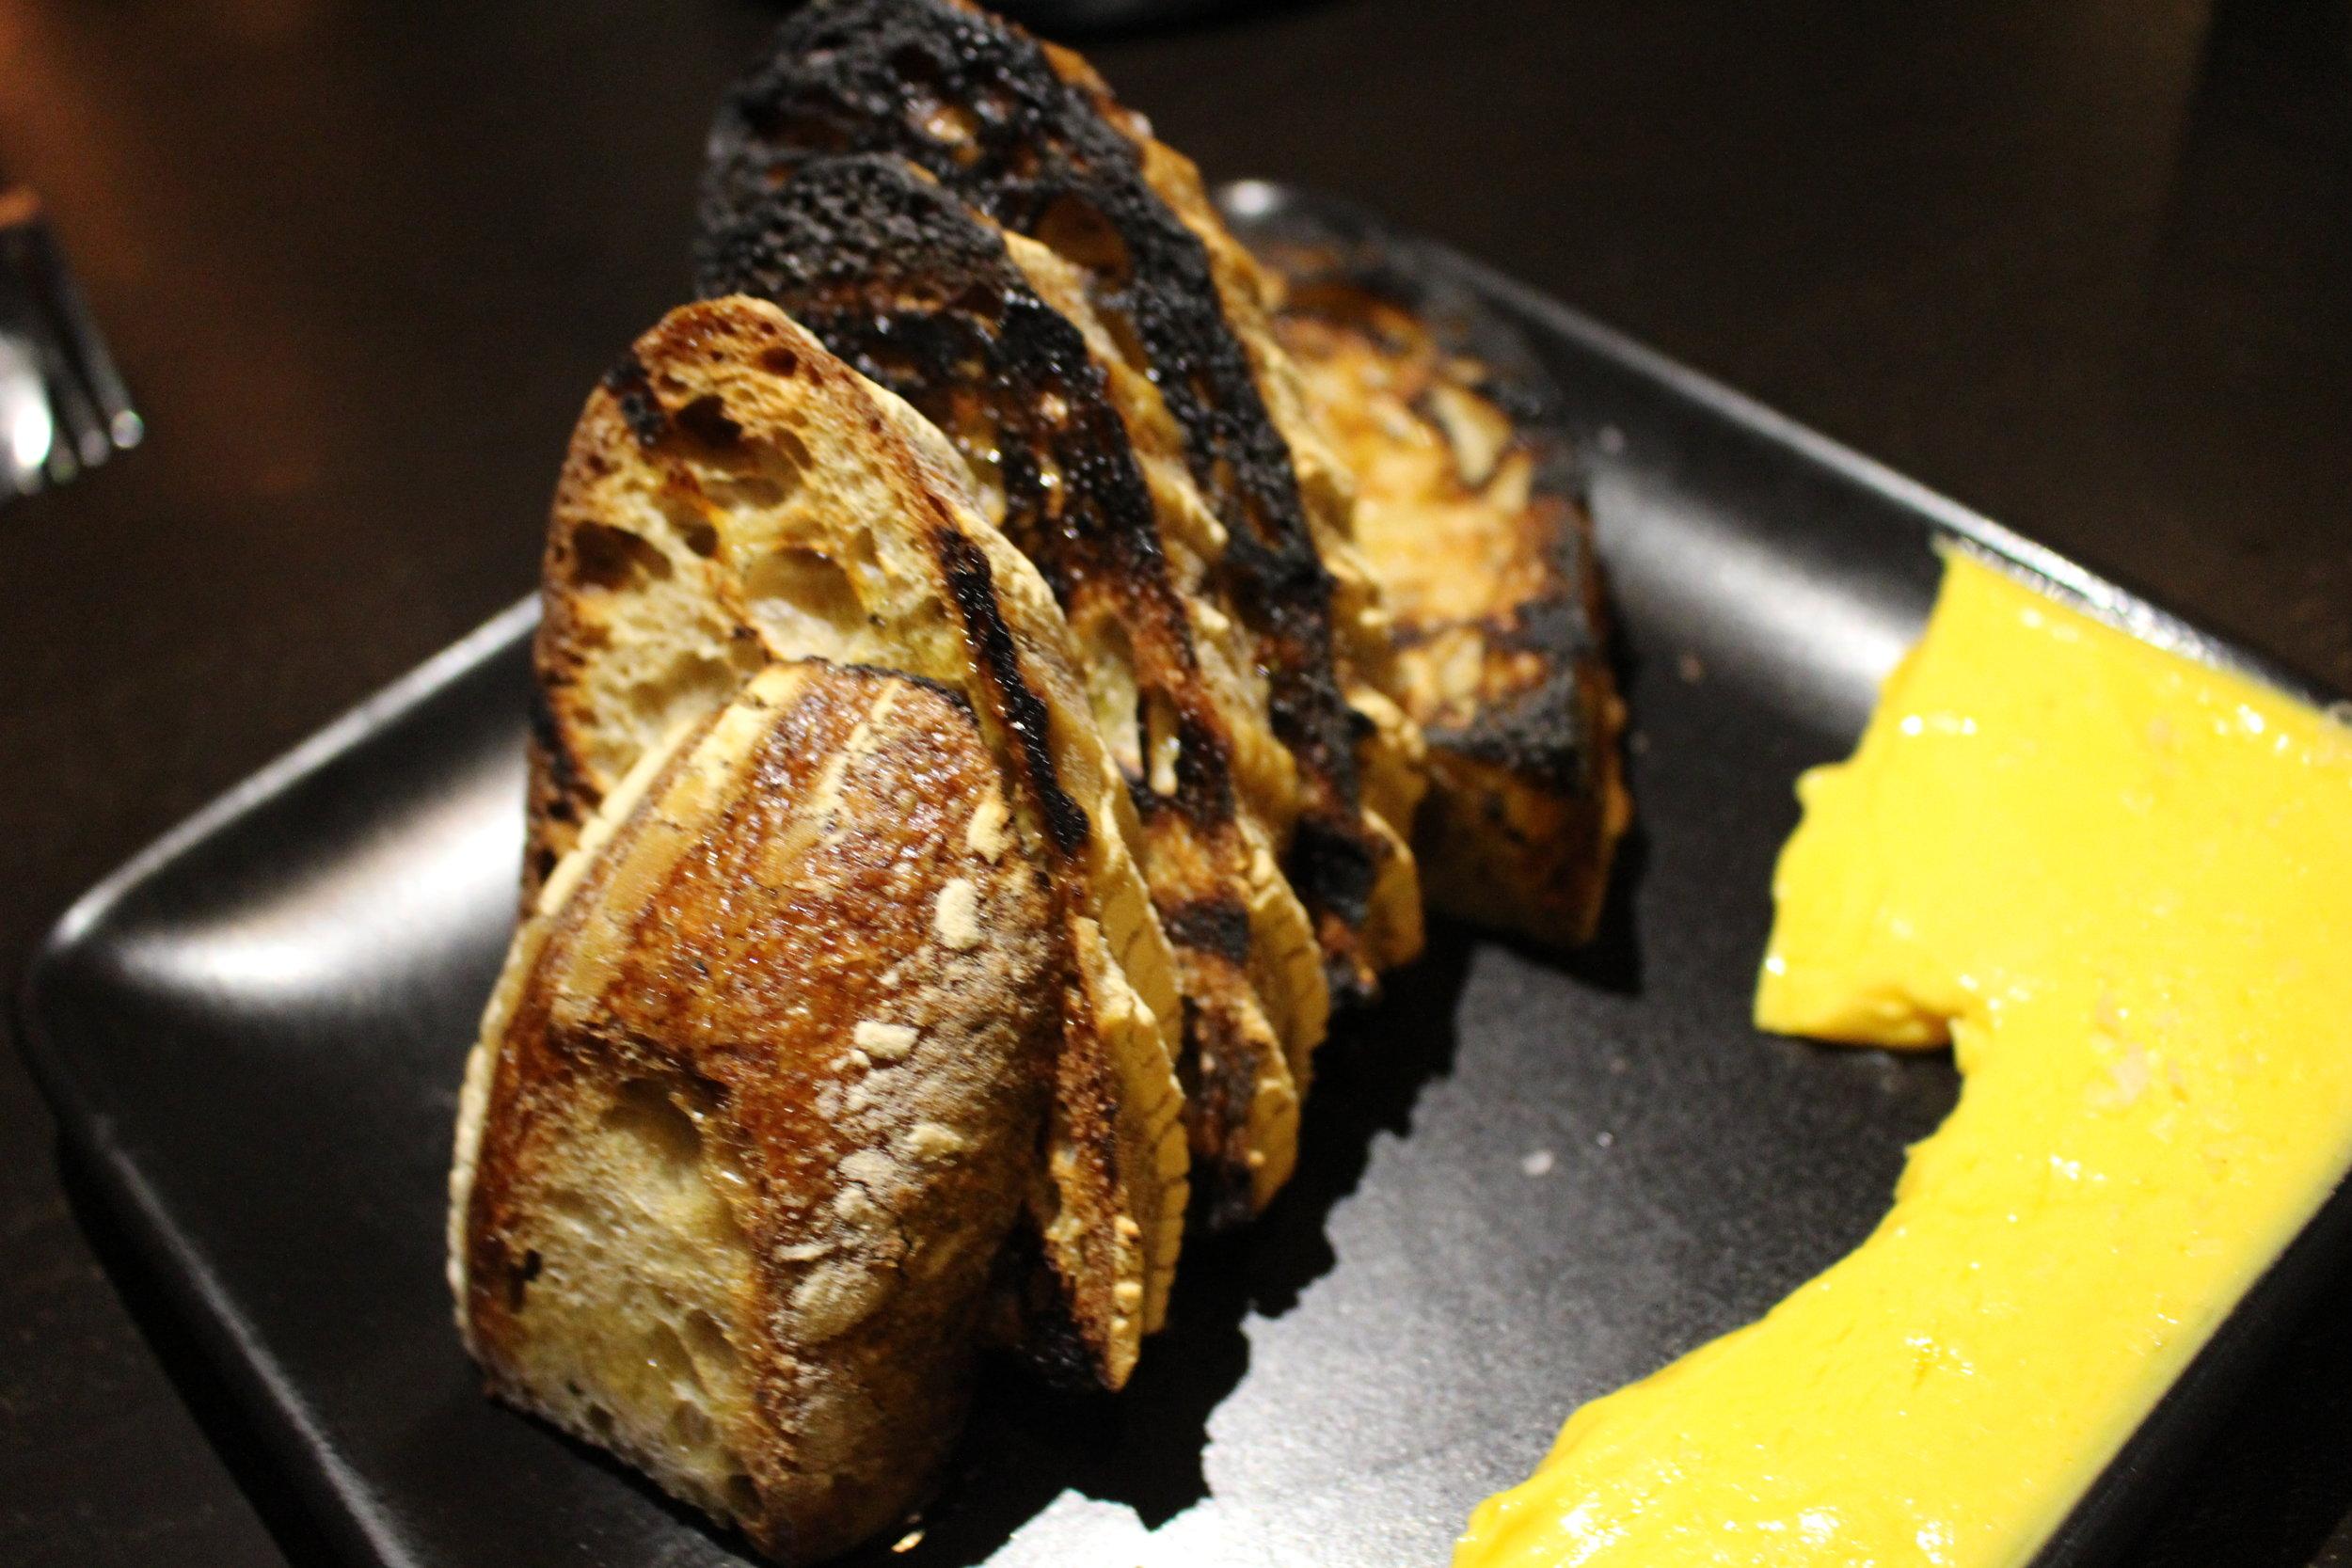 Kemper Farms wheat bread with carrot cardamom butter (Photo: Tamara Palmer)